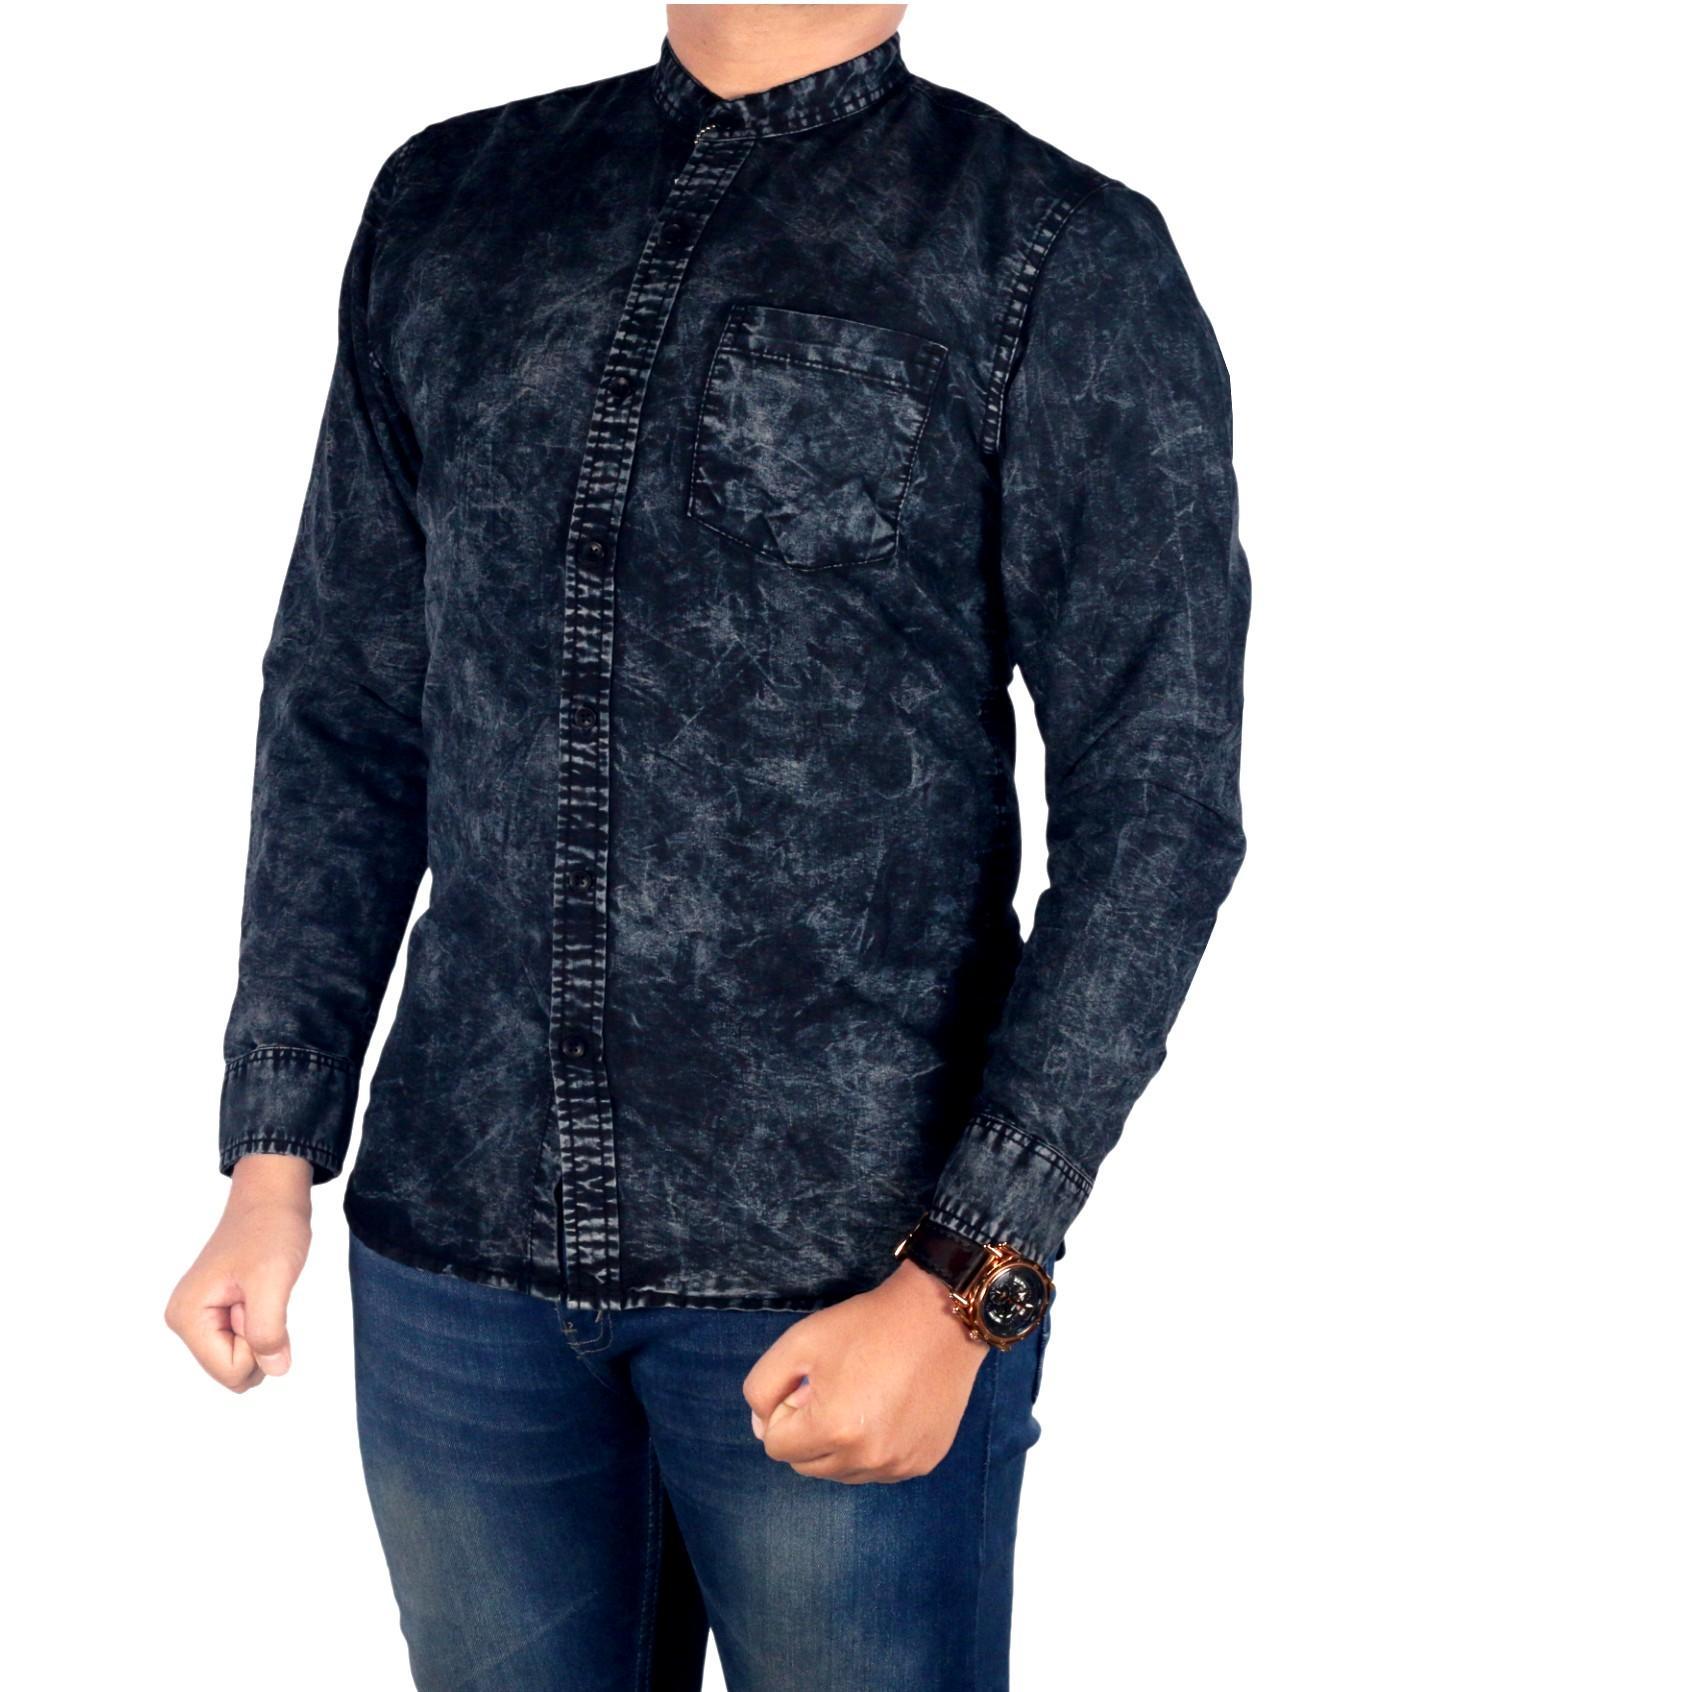 Dgm_Fashion1 Kemeja Pria jeans Polos Hitam Kerah Sanghai /Kemeja Polos/Kemeja Batik/Kemeja Casual/Kemeja Men/Kemeja Oxford/Kemeja Distro/Kemeja Jeans/Kemeja Denim/Kemeja Bunga/Kemeja Pantai /Kemeja Pendek/Batik/Kemeja Formal RX 5549